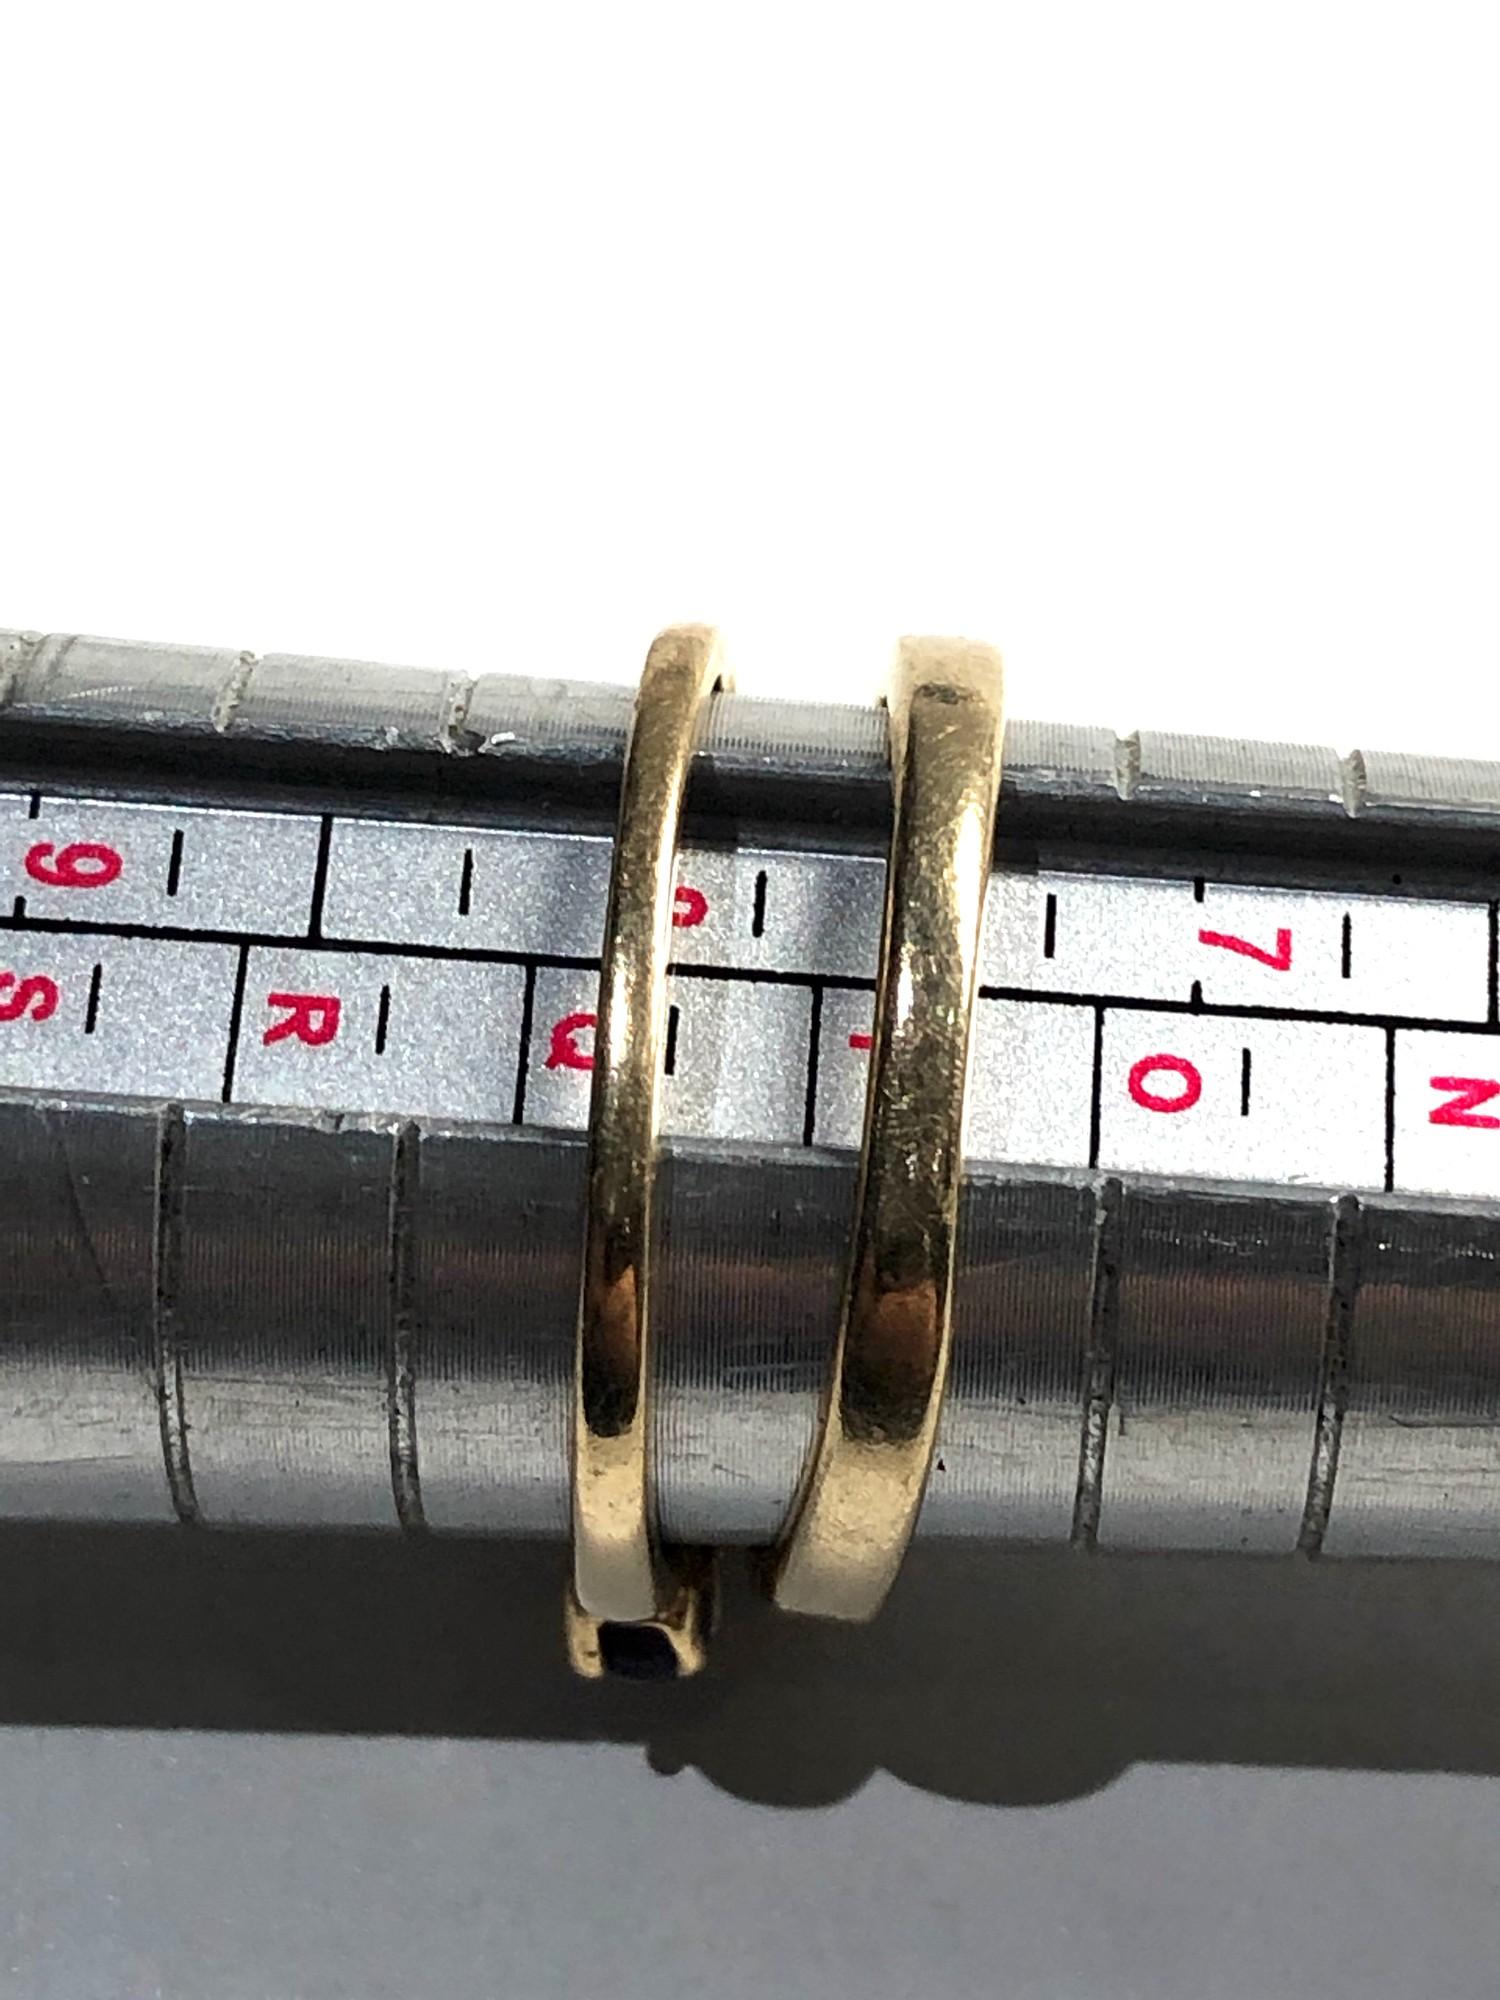 2 x 9ct Gold seven stone rings inc. ruby, amethyst, diamond 3.2g - Image 3 of 3